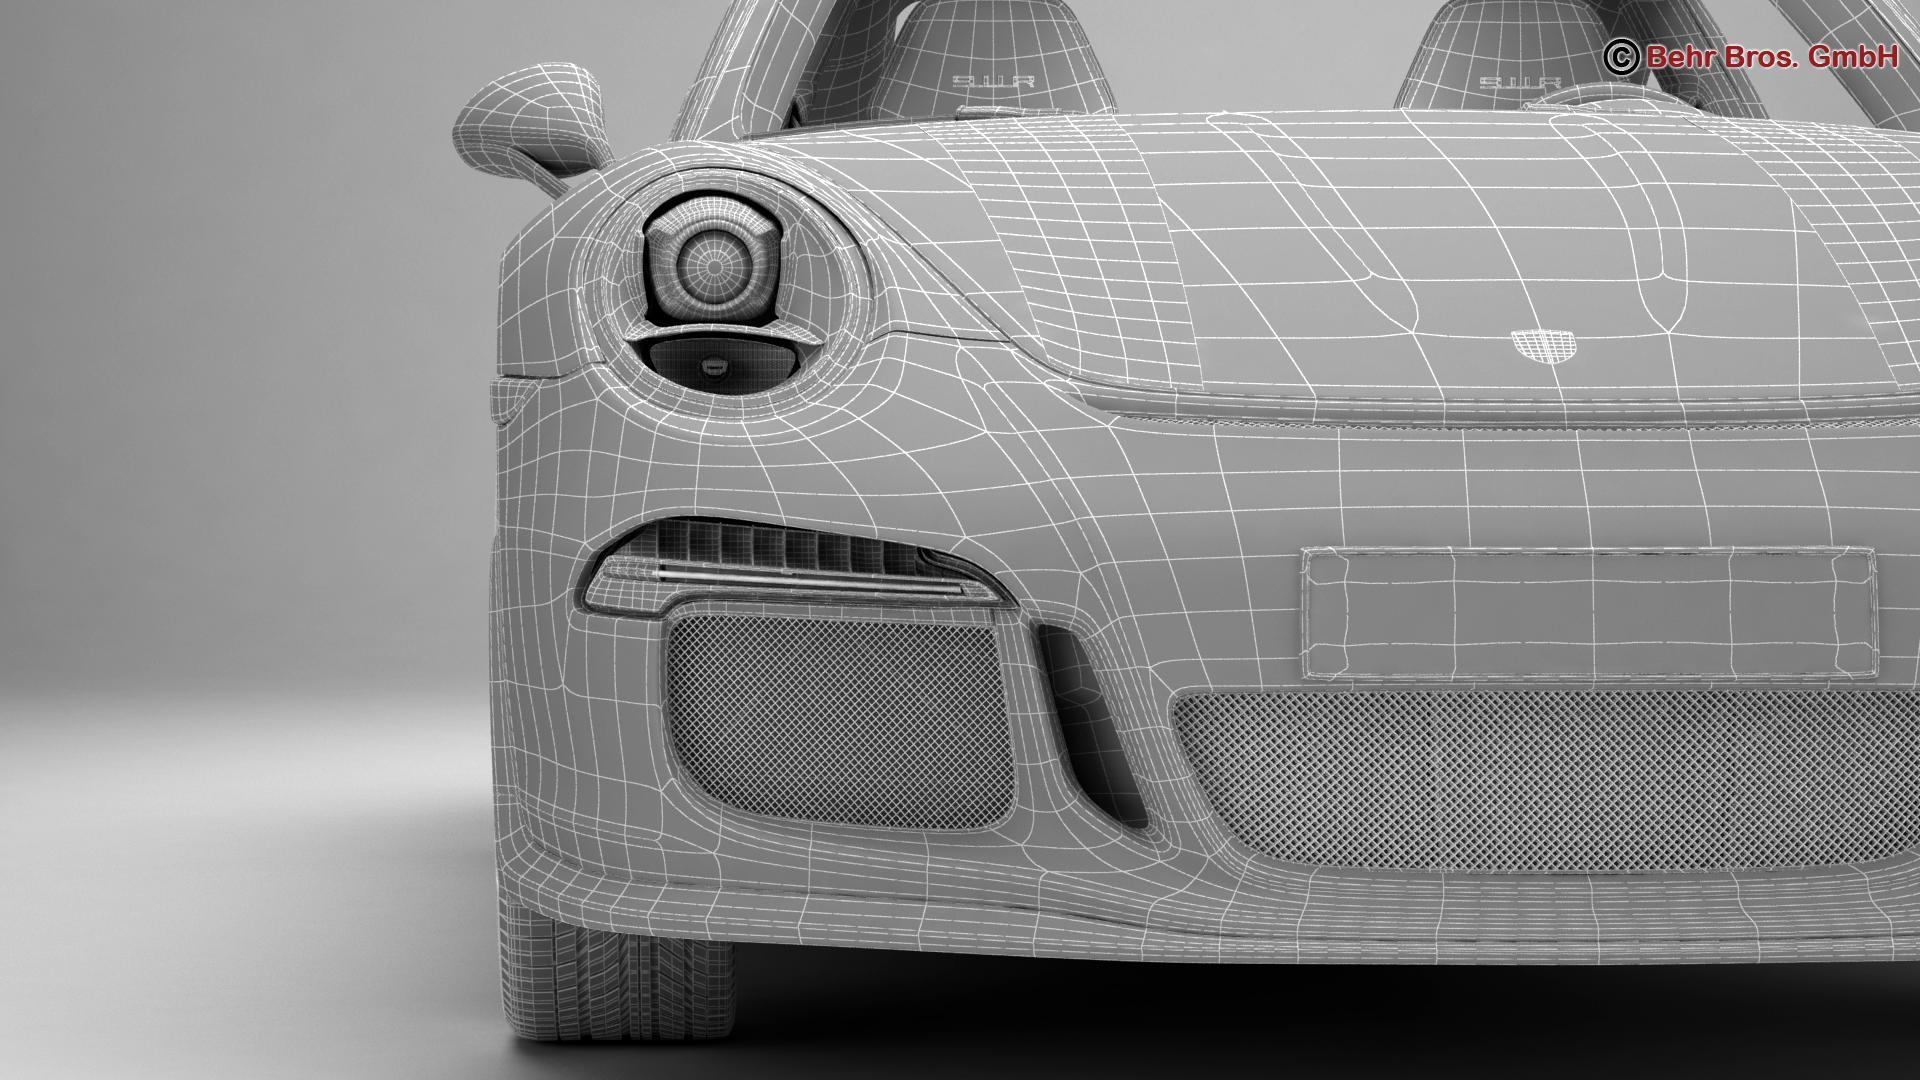 porsche 911 r 2017 3d model 3ds max fbx c4d lwo ma mb obj 220021